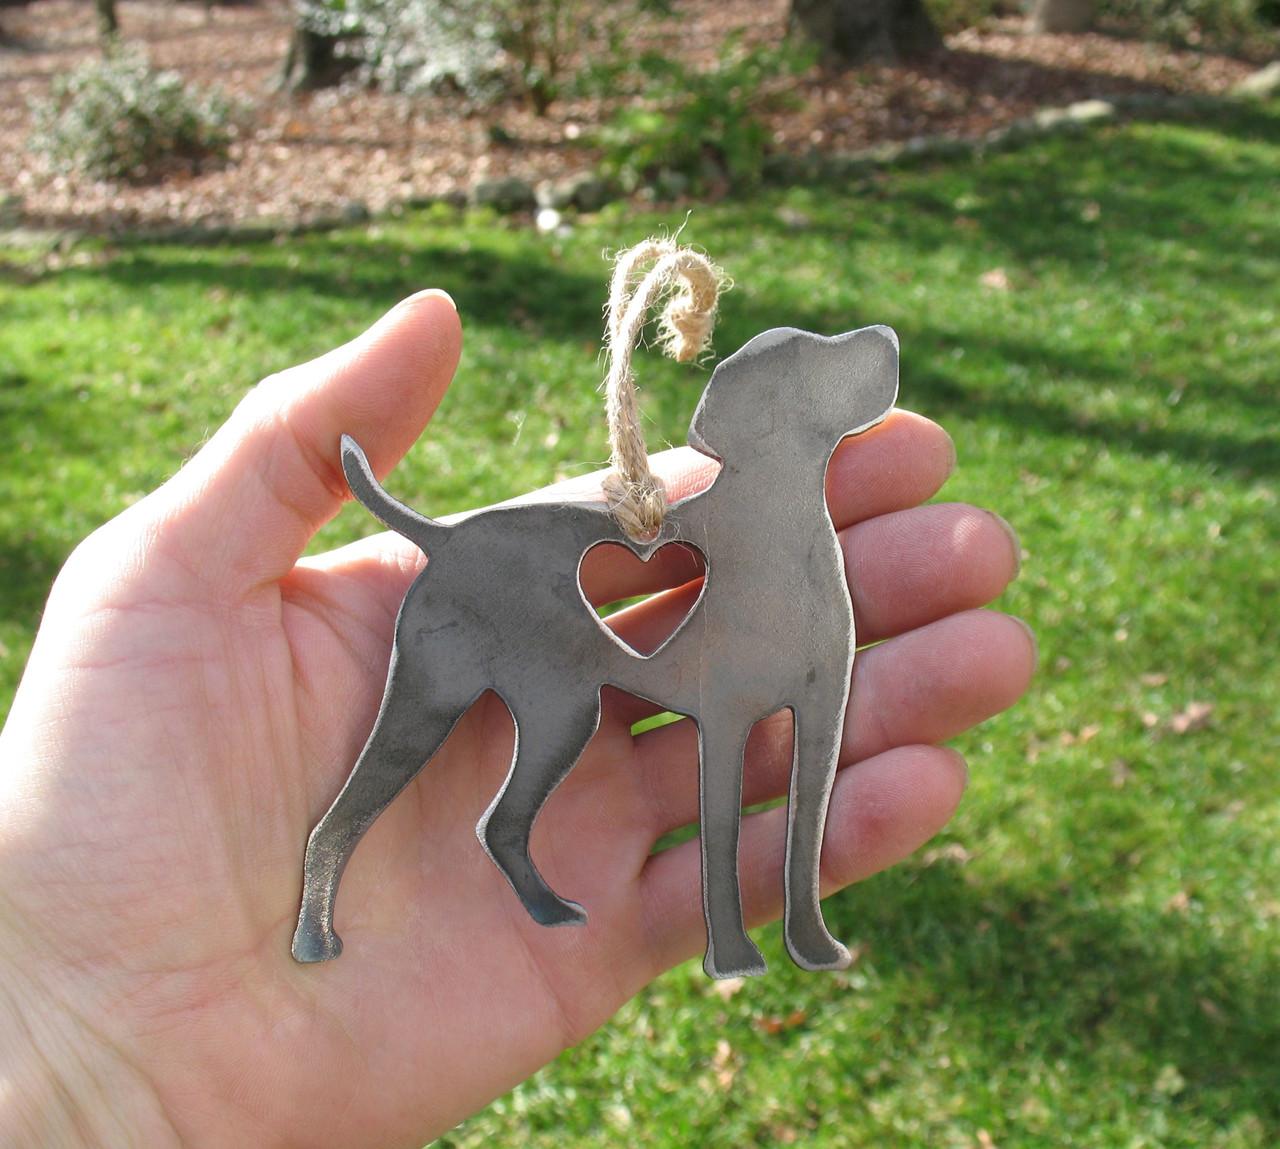 Vizsla Dog Ornament - Metal Dog Christmas Ornament - Pet Lover Memorial Ornament - Pet Loss Dog Memorial Ornament Remembrance Gift